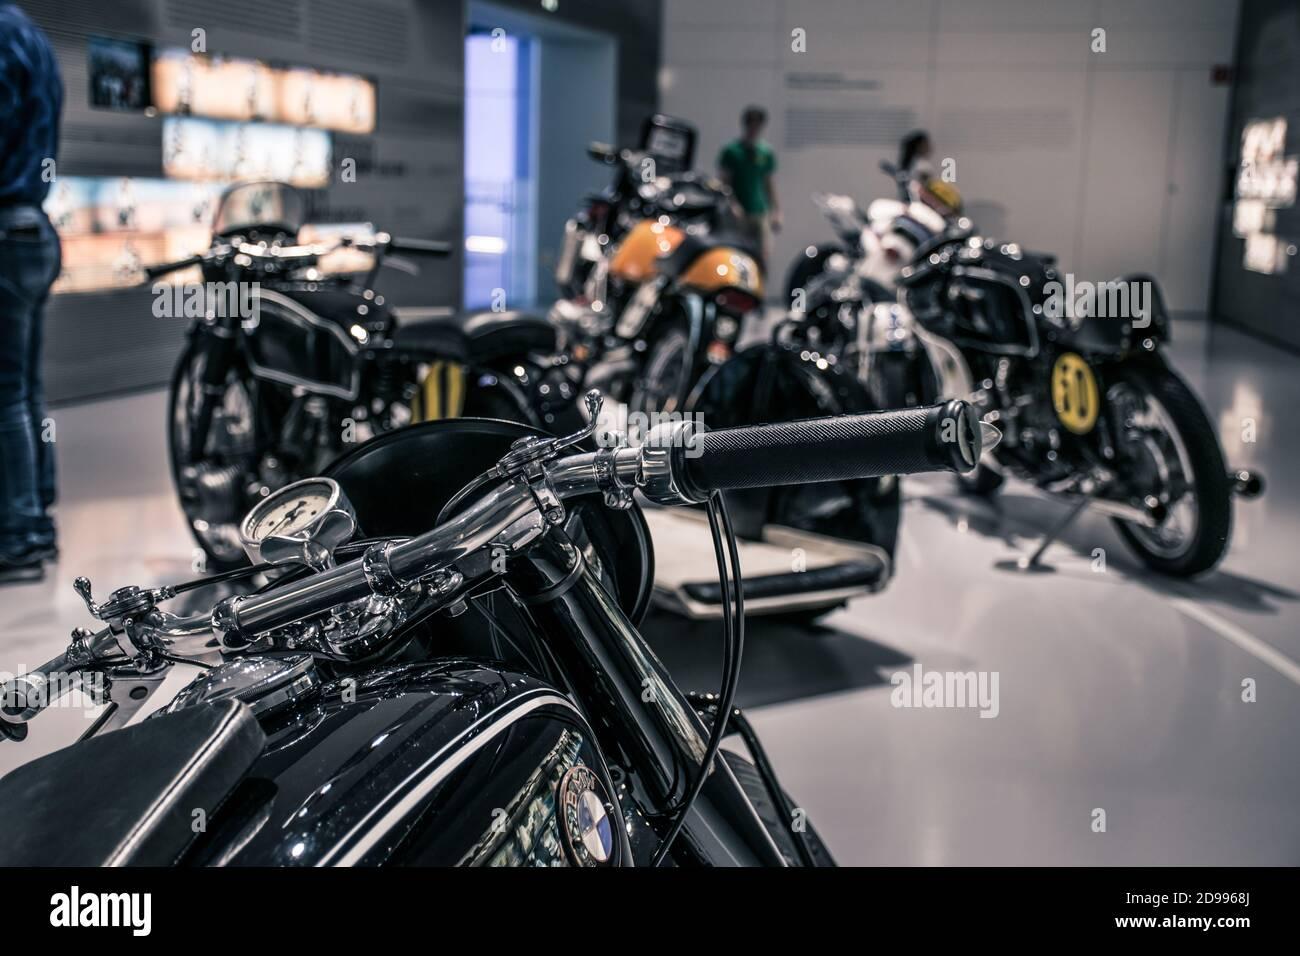 Munich Germany May 24 2019 Classic Bmw Motorcycles In Bmw Museum Bmw Welt Stock Photo Alamy